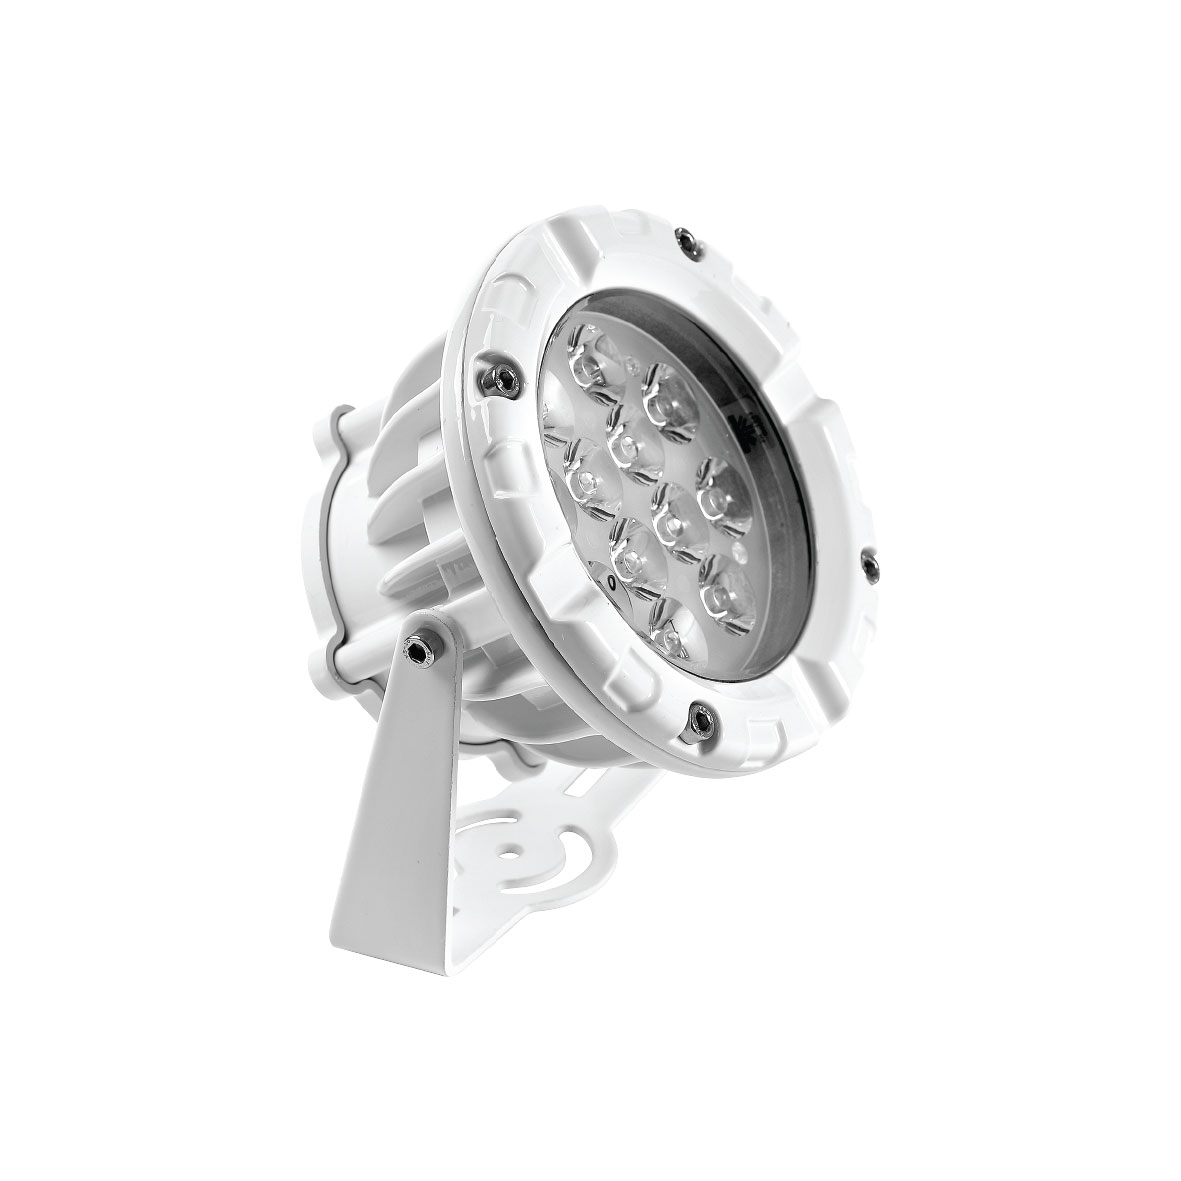 پروژکتورها-SH-1292-12W